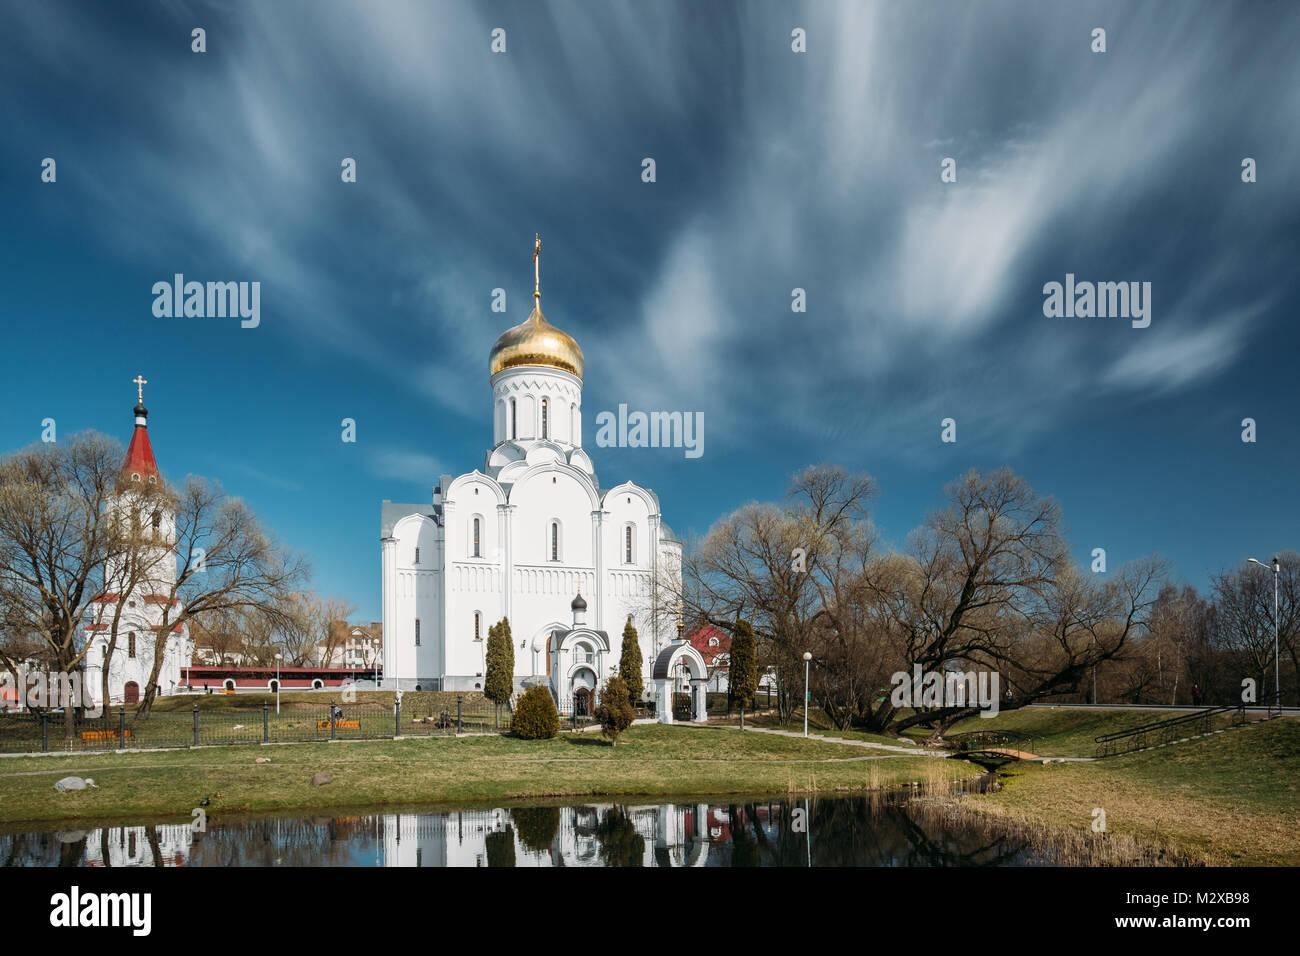 belarus land